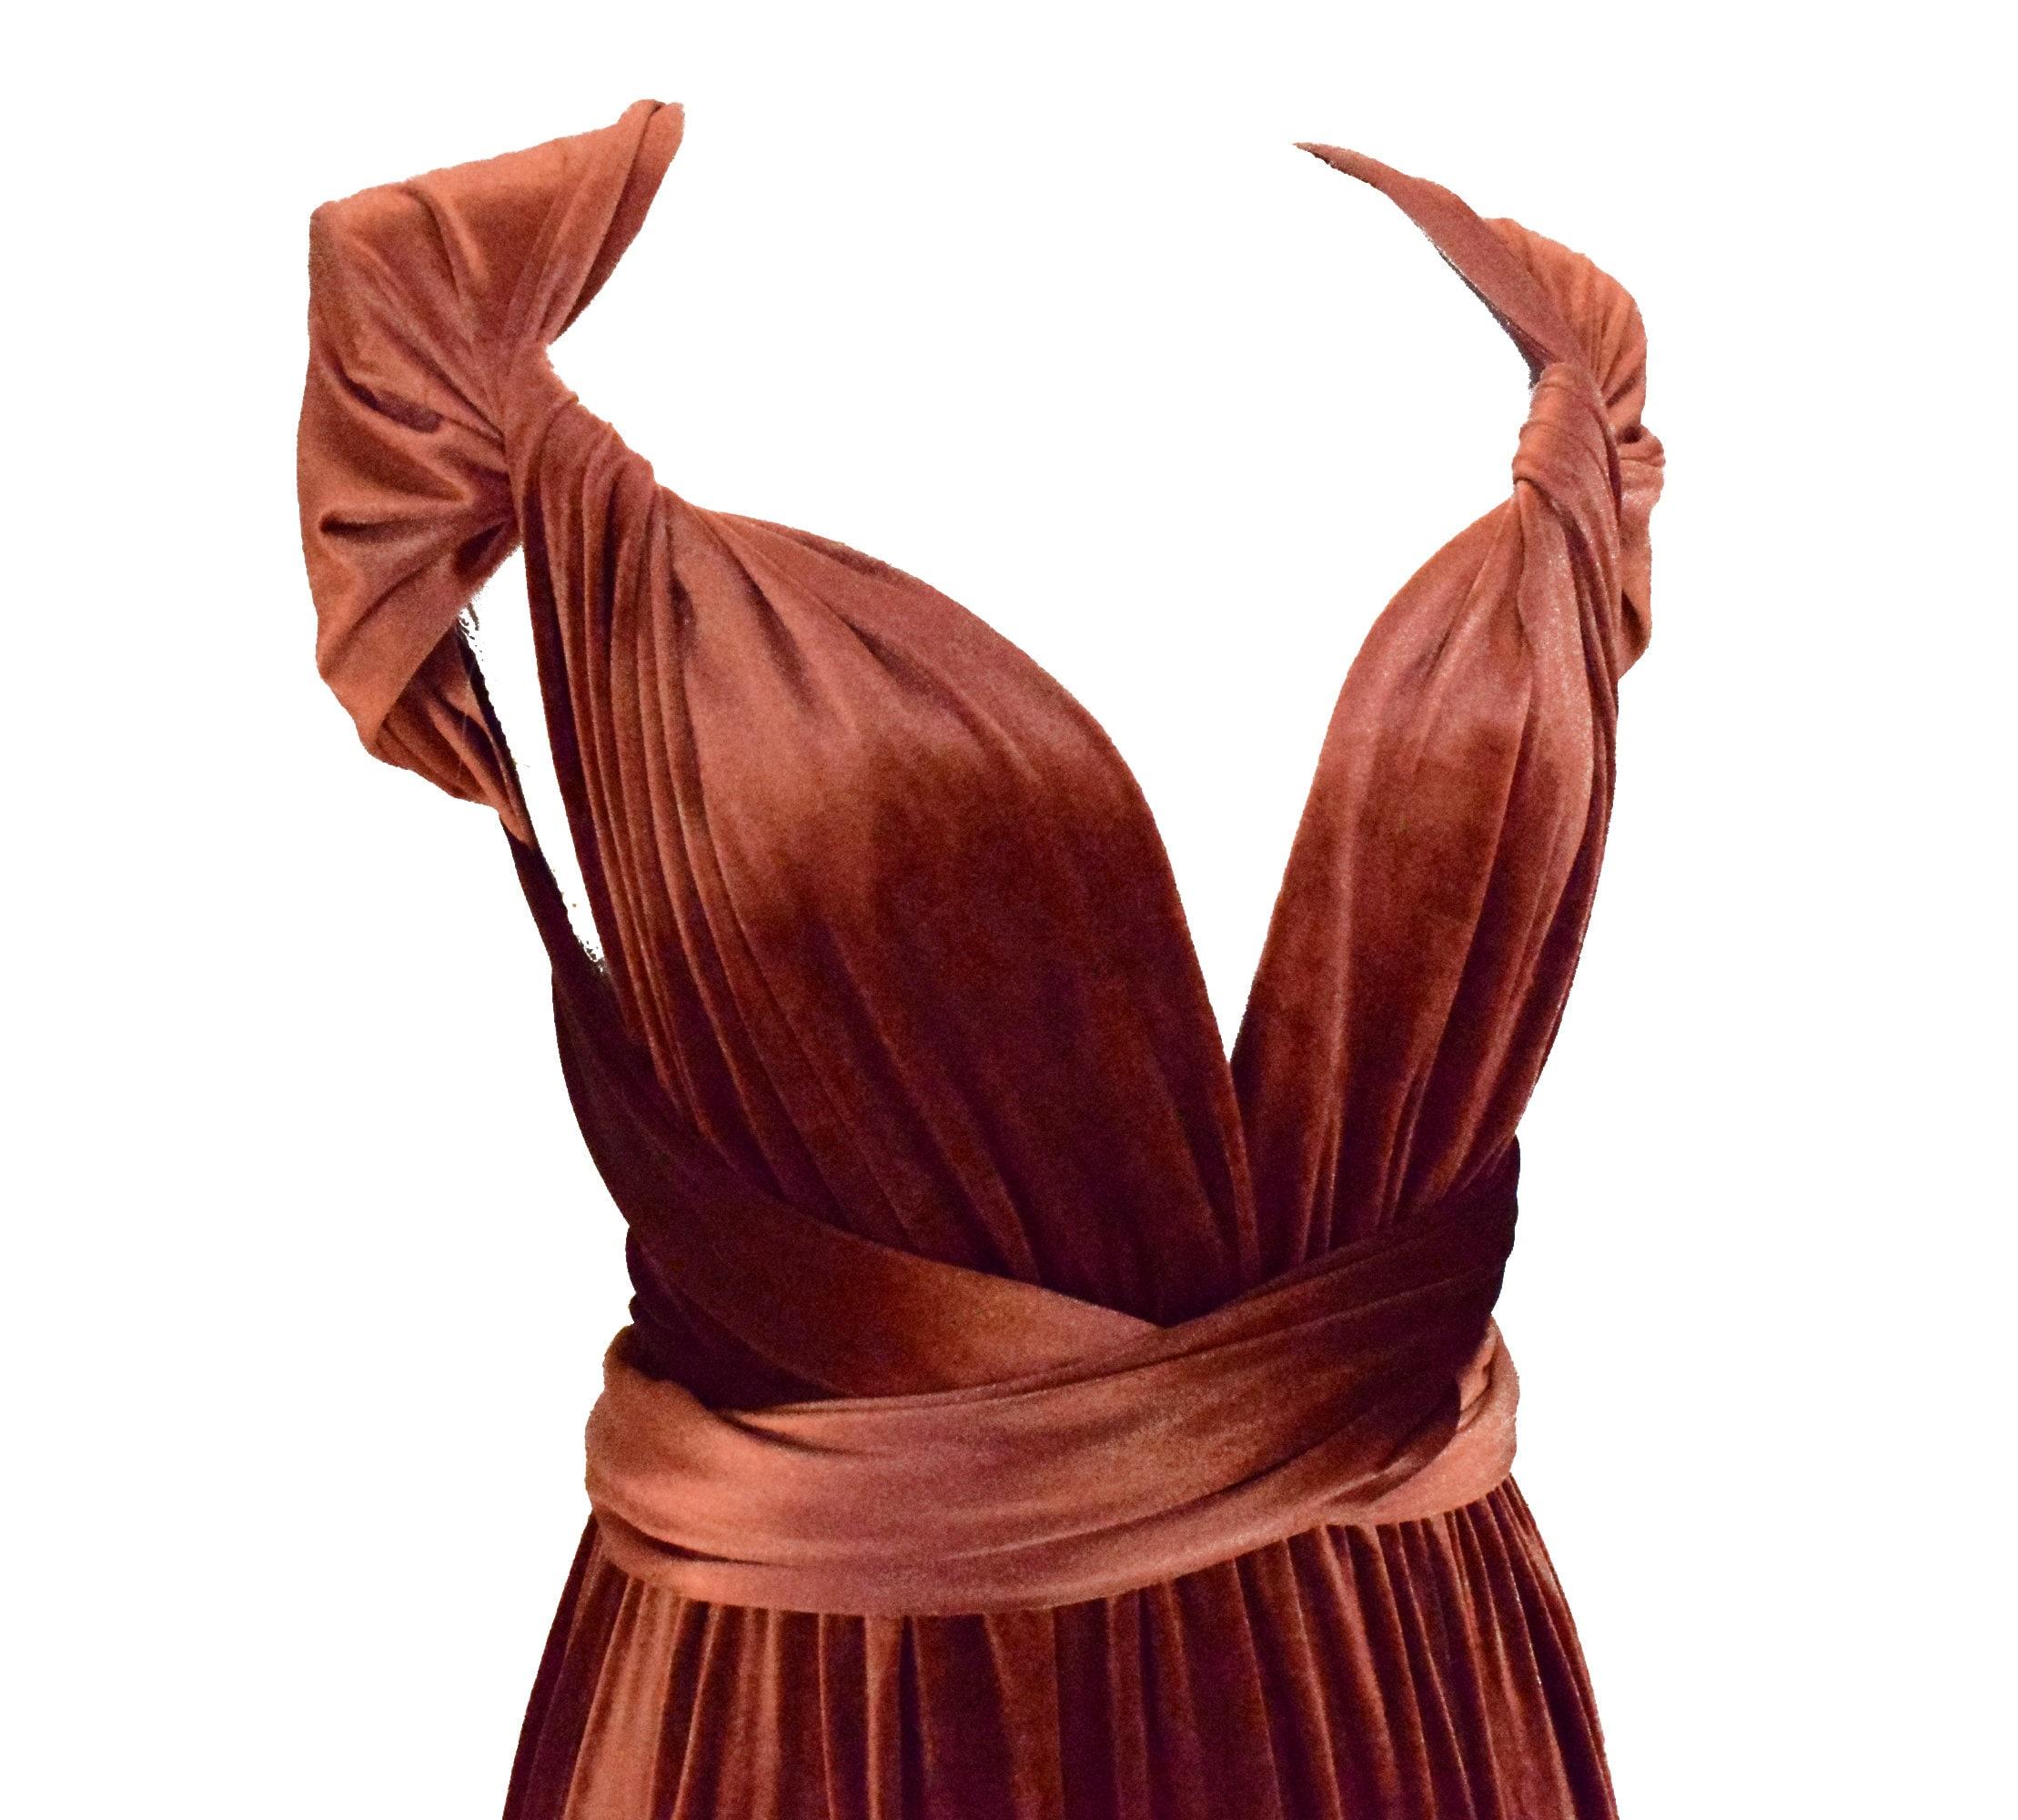 PLUM VELVET Infinity Dress Bridesmaids Dress Convertible Dress  Multiway Dress Multiway Wrap Dress  Velvet Bridesmaids Dress